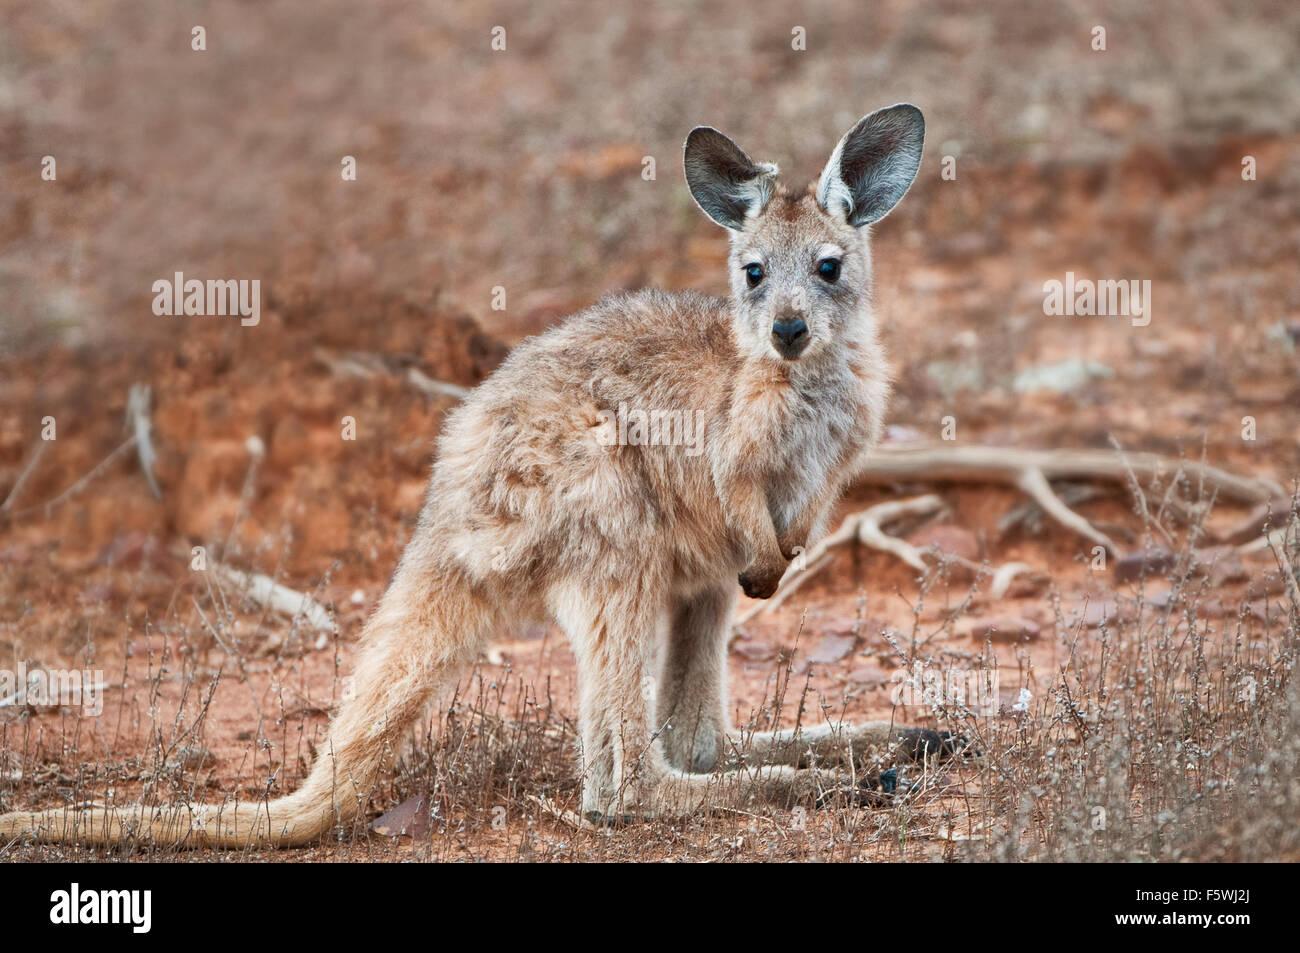 Kangaroo Joey of the species Euro (Wallaroo). - Stock Image